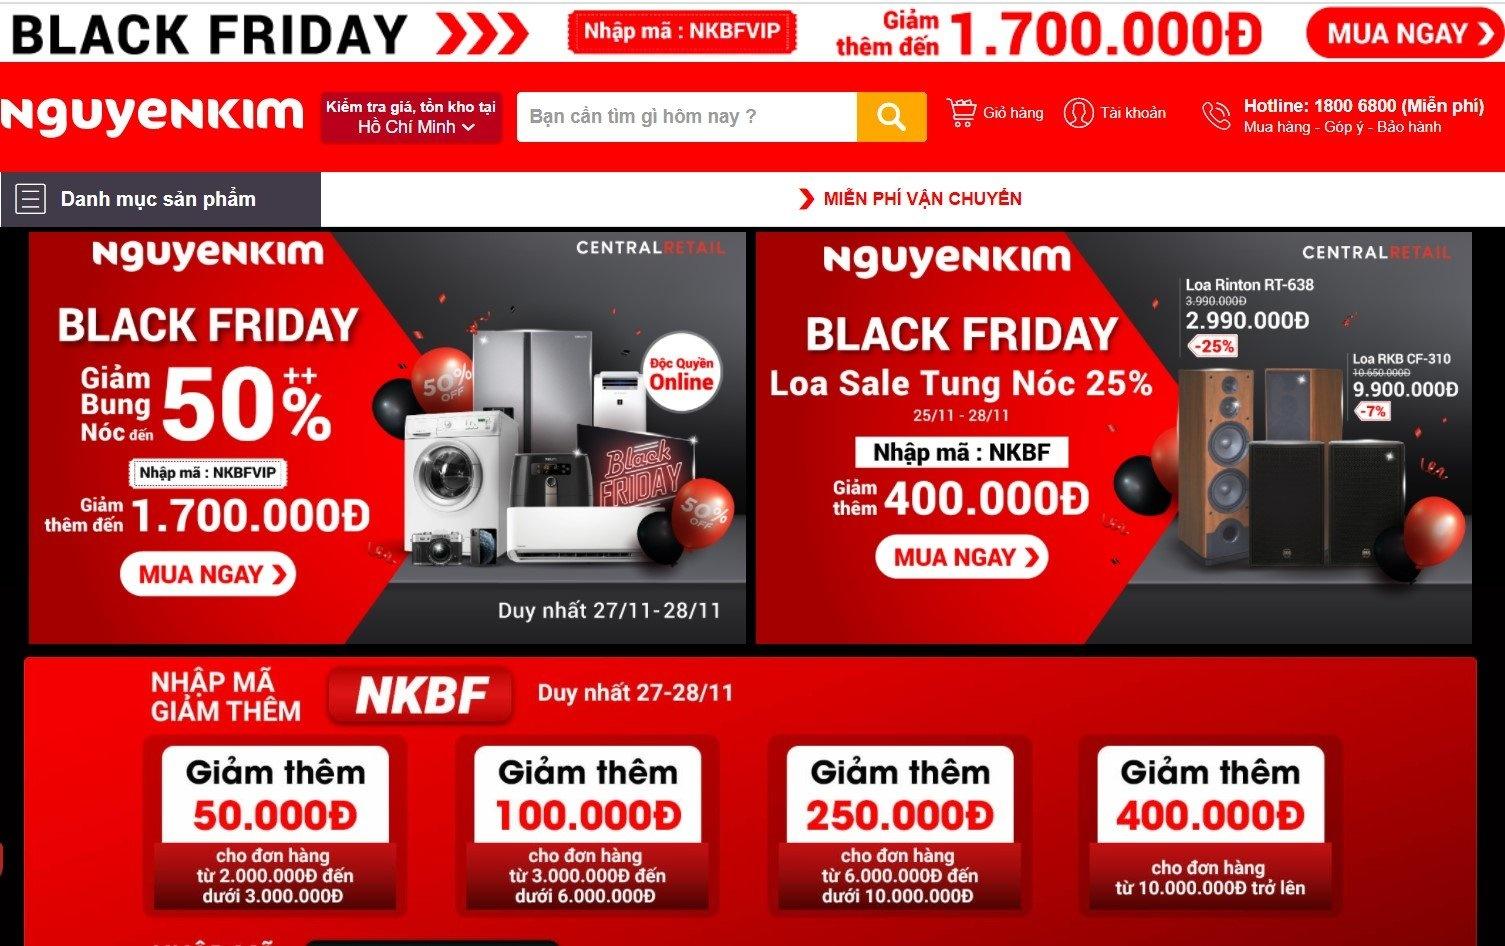 Black Friday,  mua sam,  deal Black Friday Viet Nam 2020 anh 2